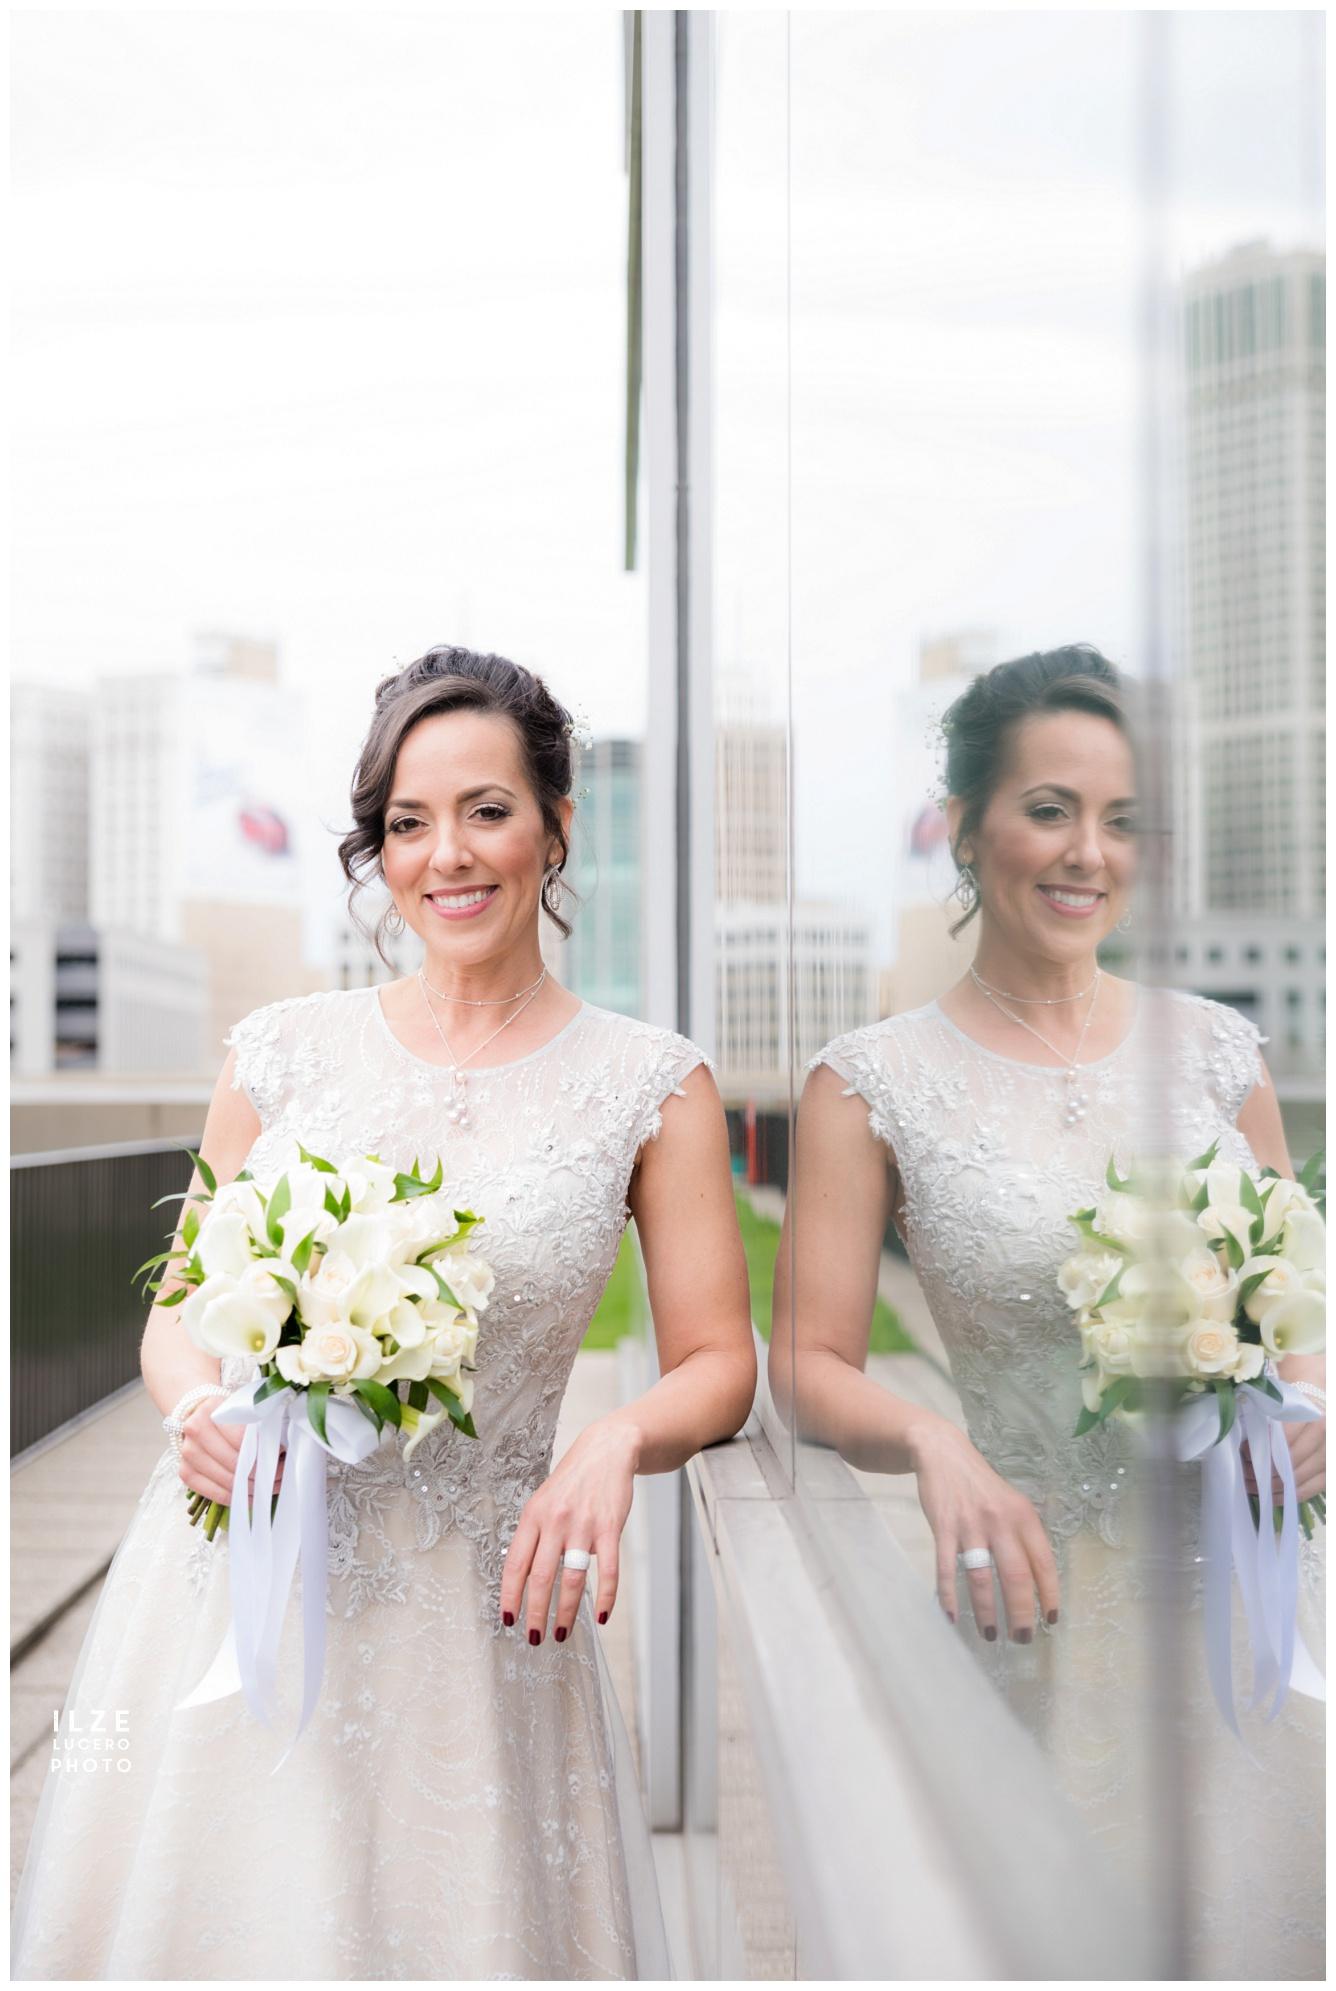 Detroit  architecture wedding